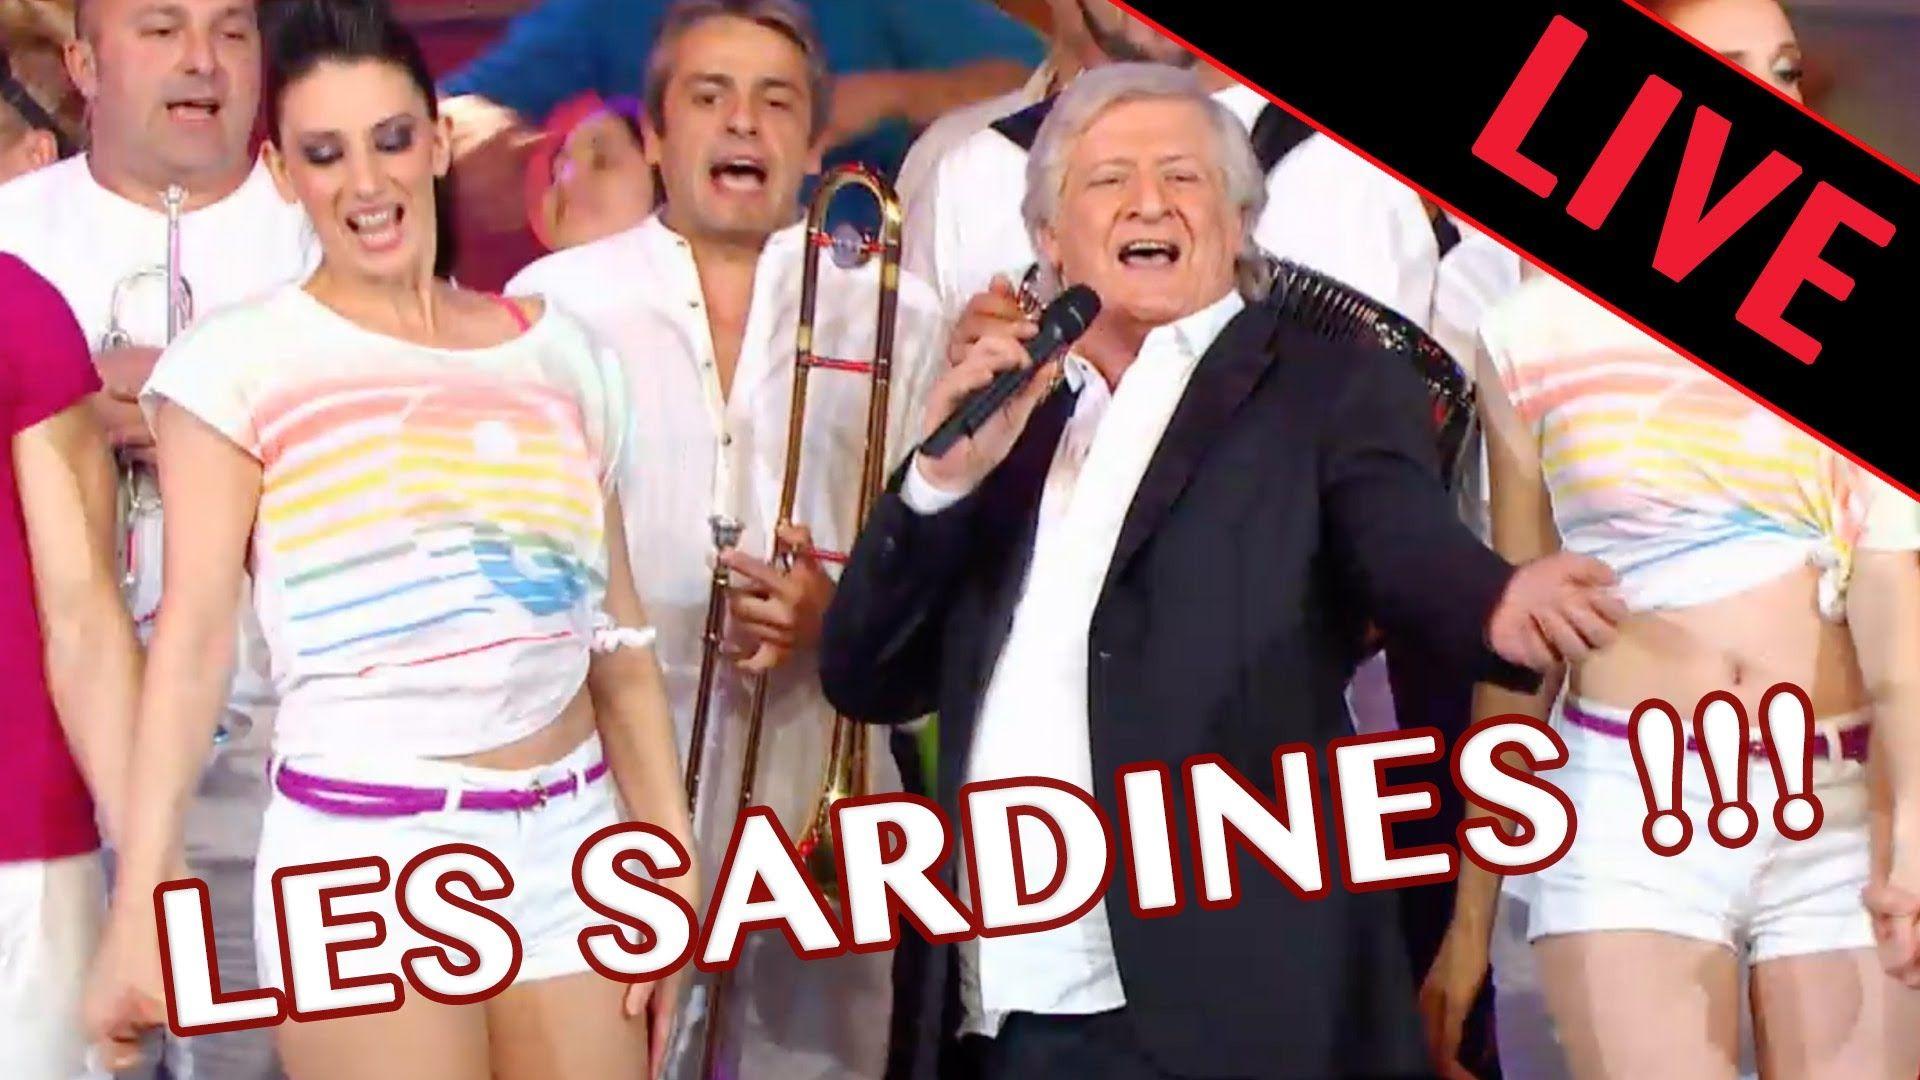 patrick sebastien les sardines